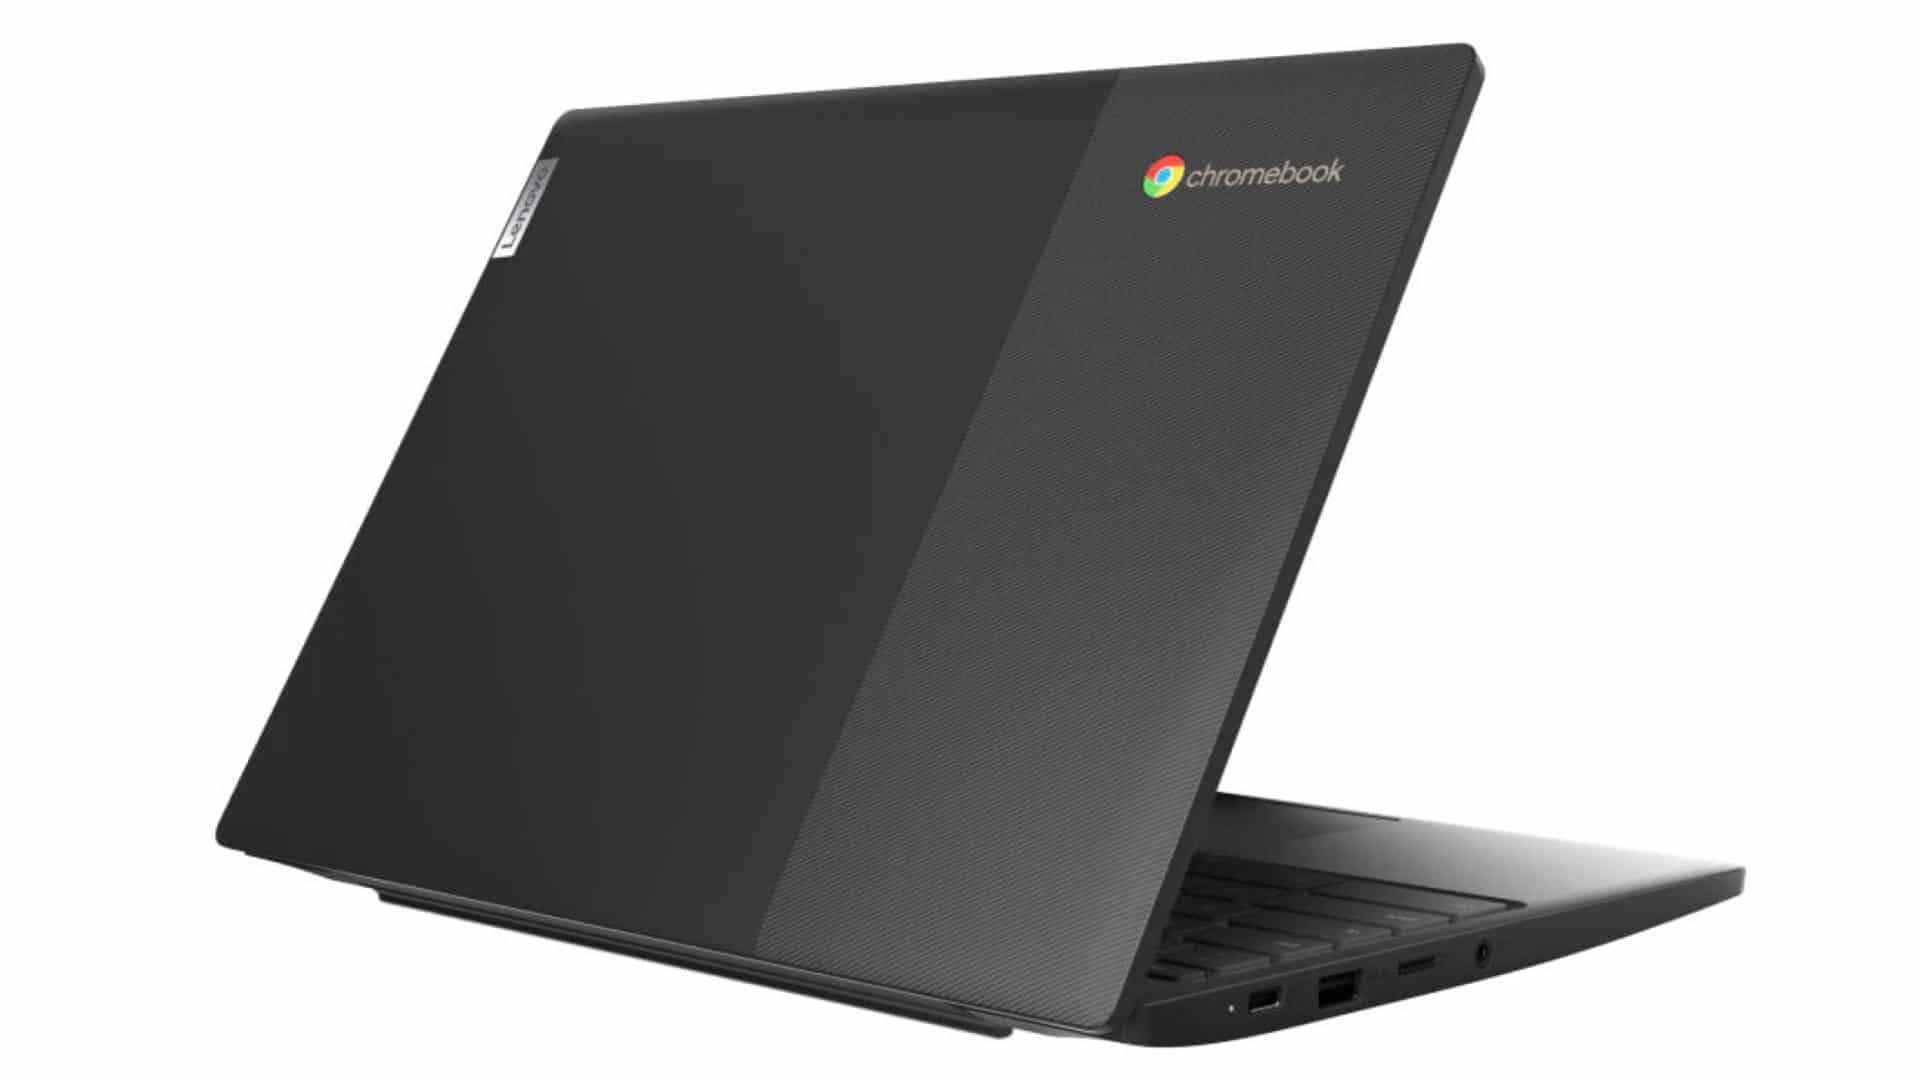 Lenovo Chromebook 3 11 presser 00